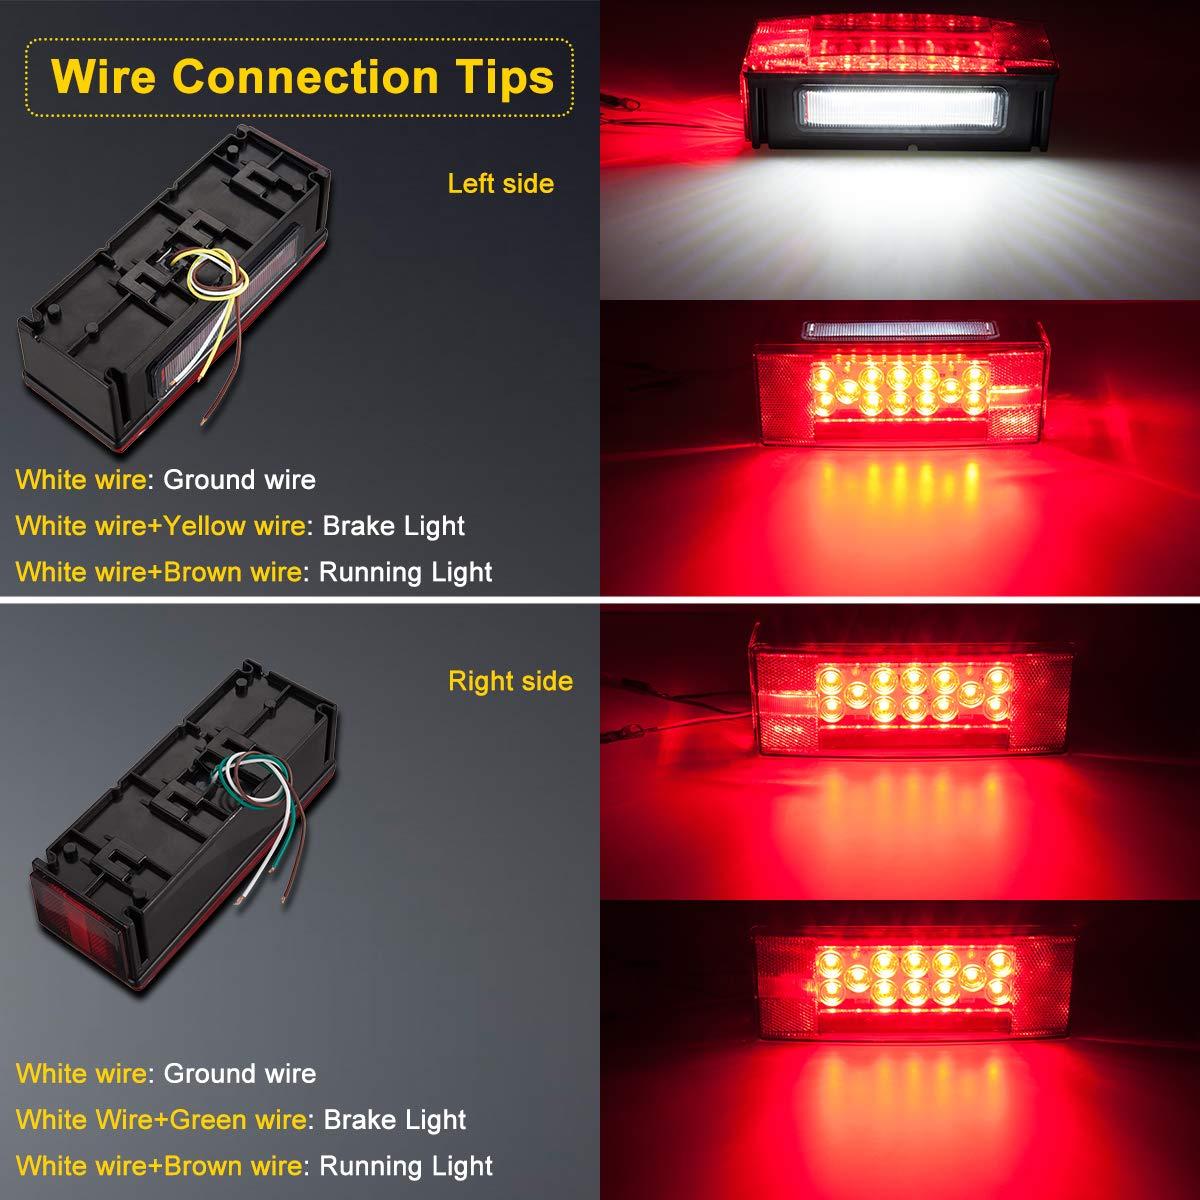 Limicar Led Trailer Lights Kit Waterproof 12v Wiring A Light Fixture Green Wire Rectangular Stop Brake Turn Running Marker With License Plate Bracket